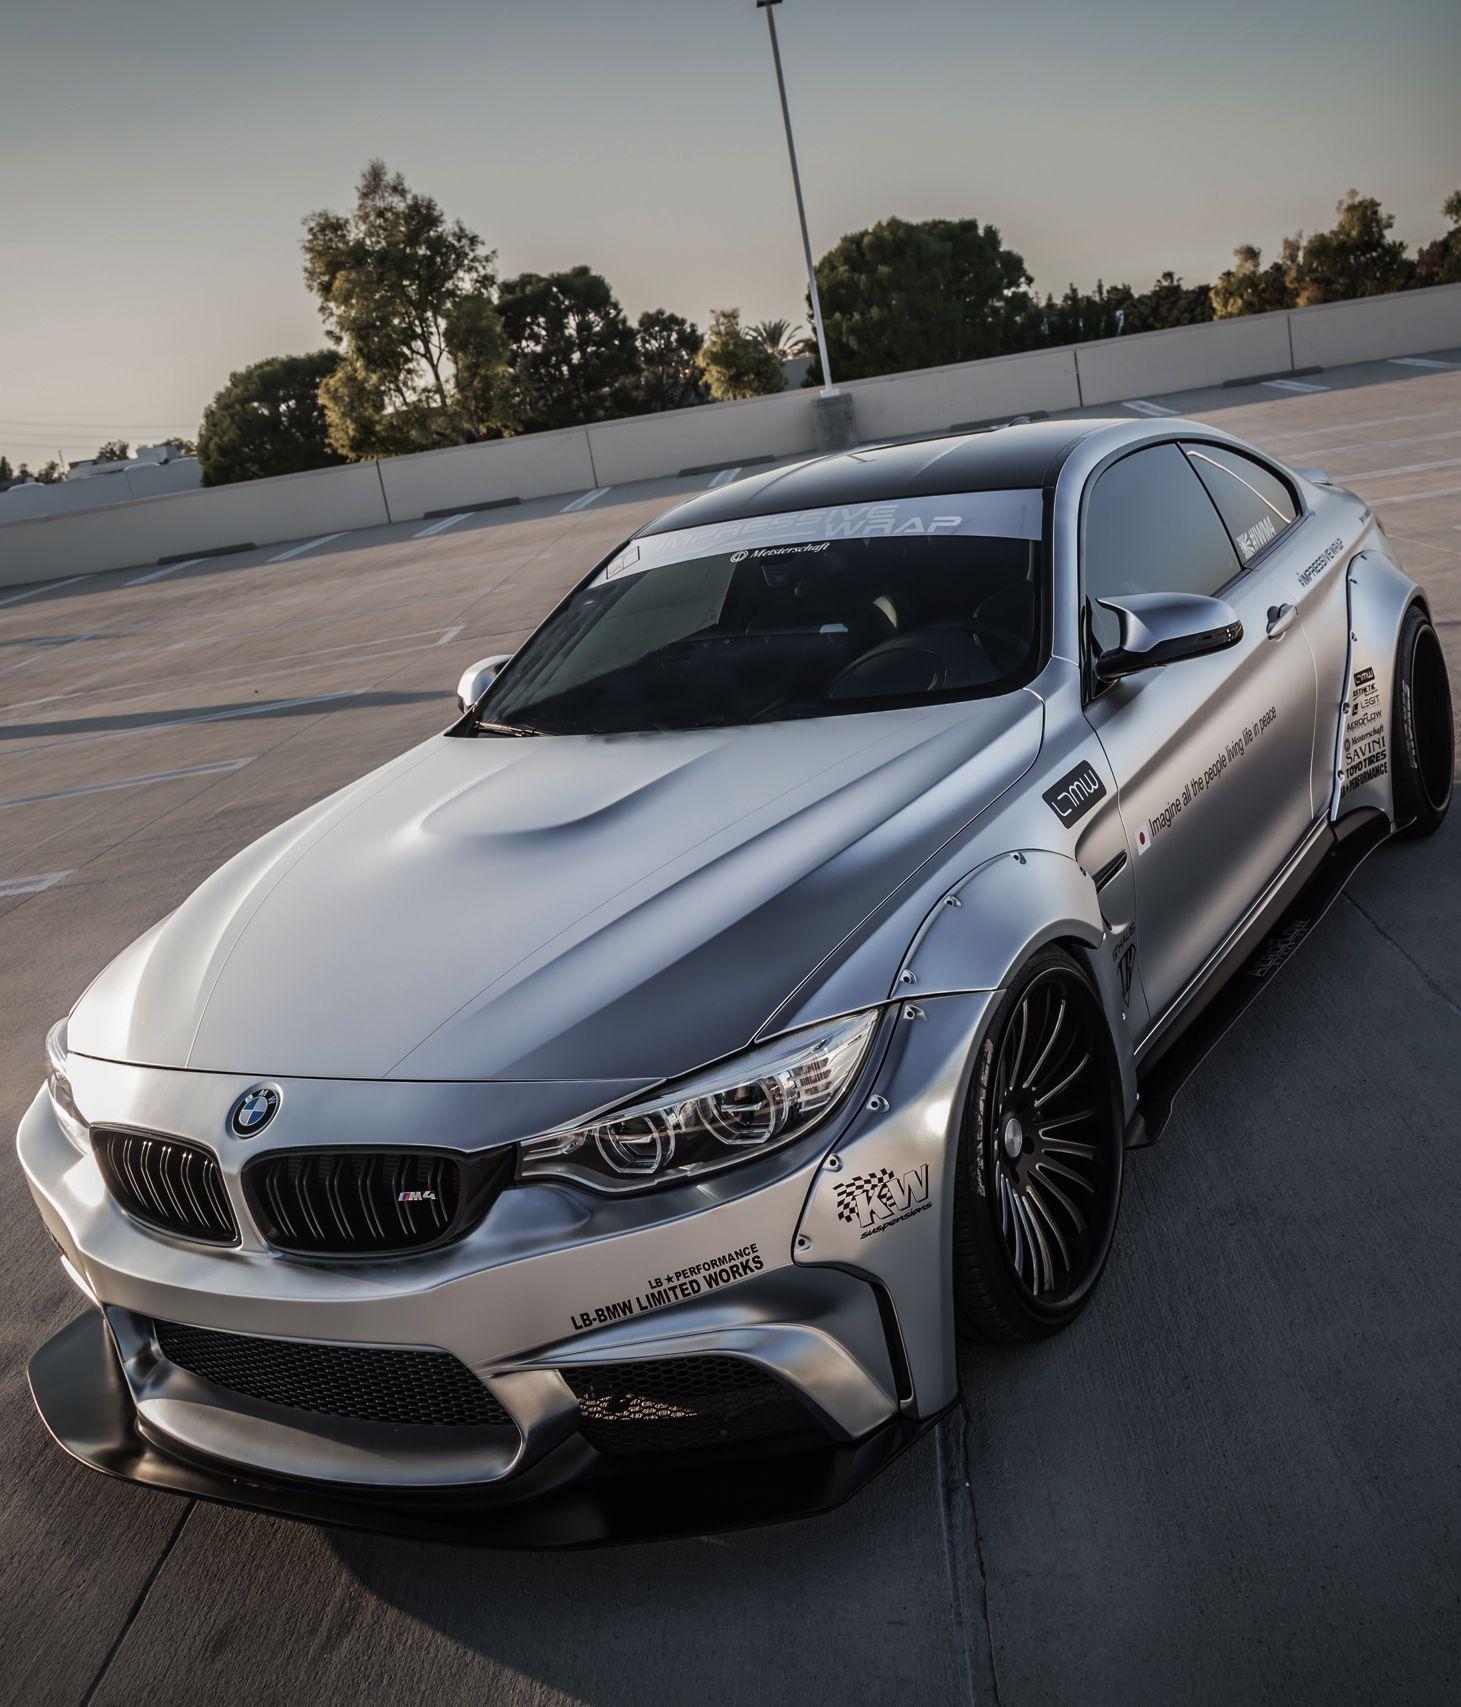 Bmw M4: Liberty Walk BMW M4 ____________________________ #PACKAIR